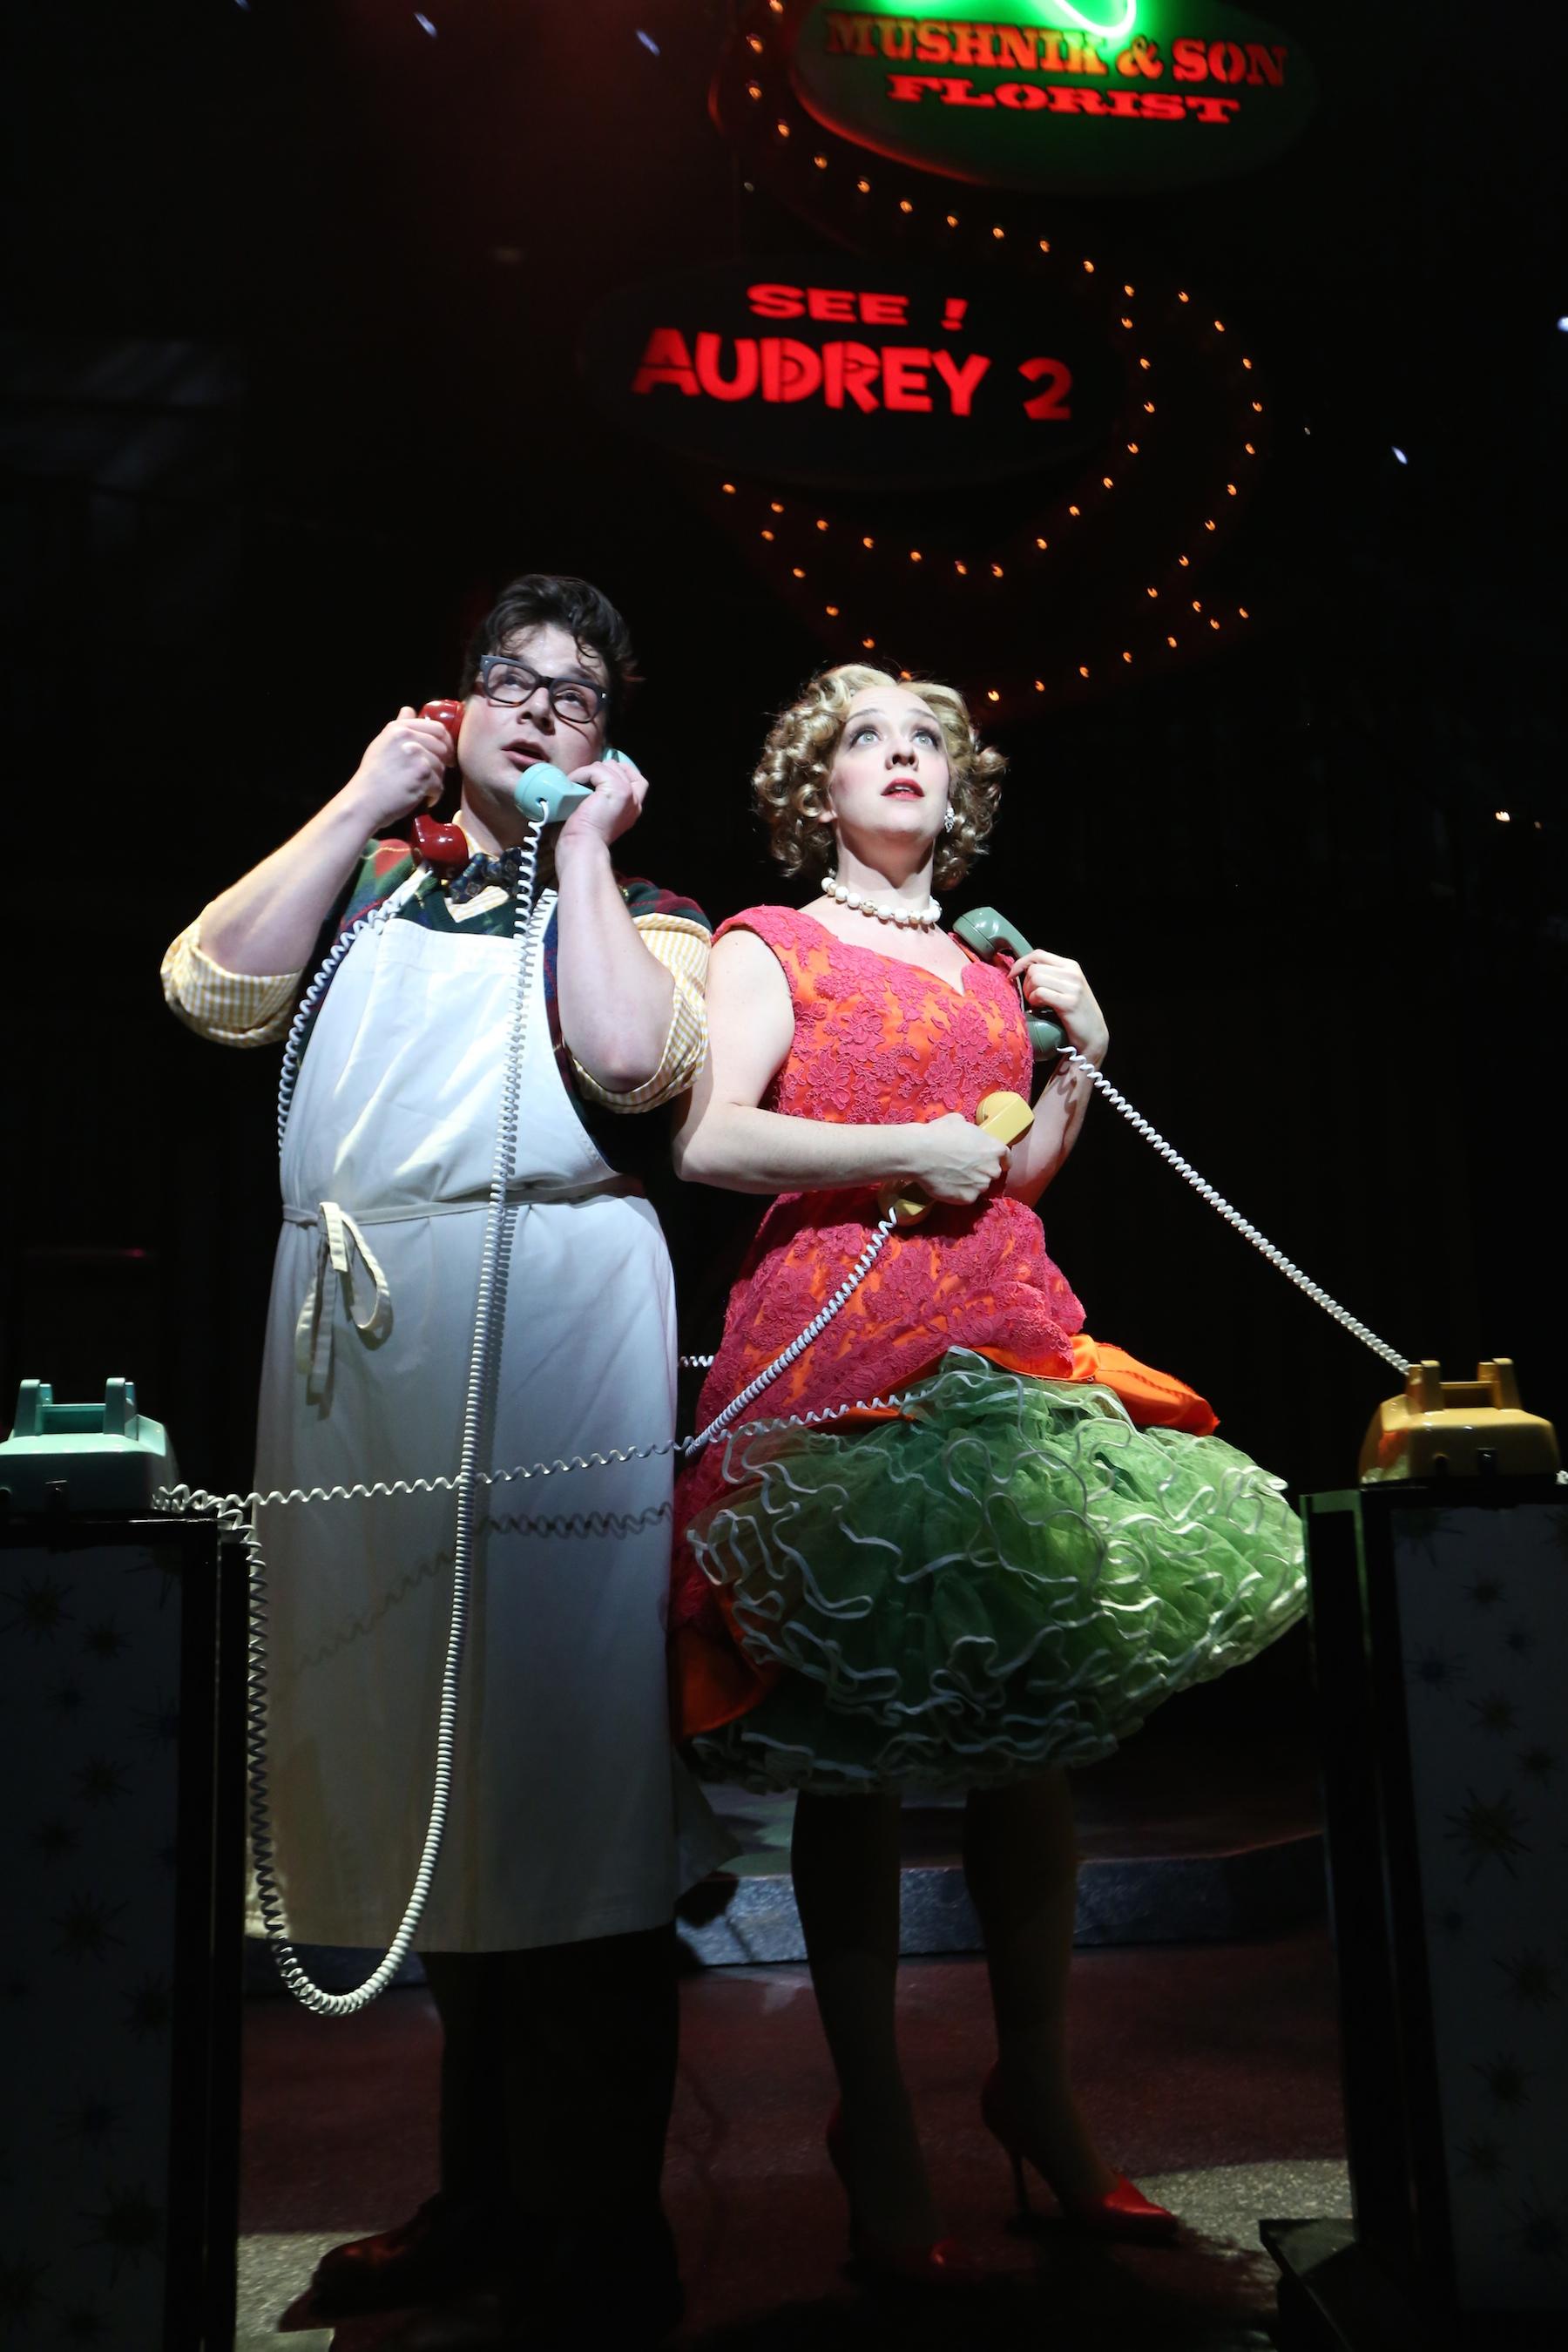 Seymour (Will Blum) and Audrey (Kristen Mengelkoch). Photo by Ken Huth.